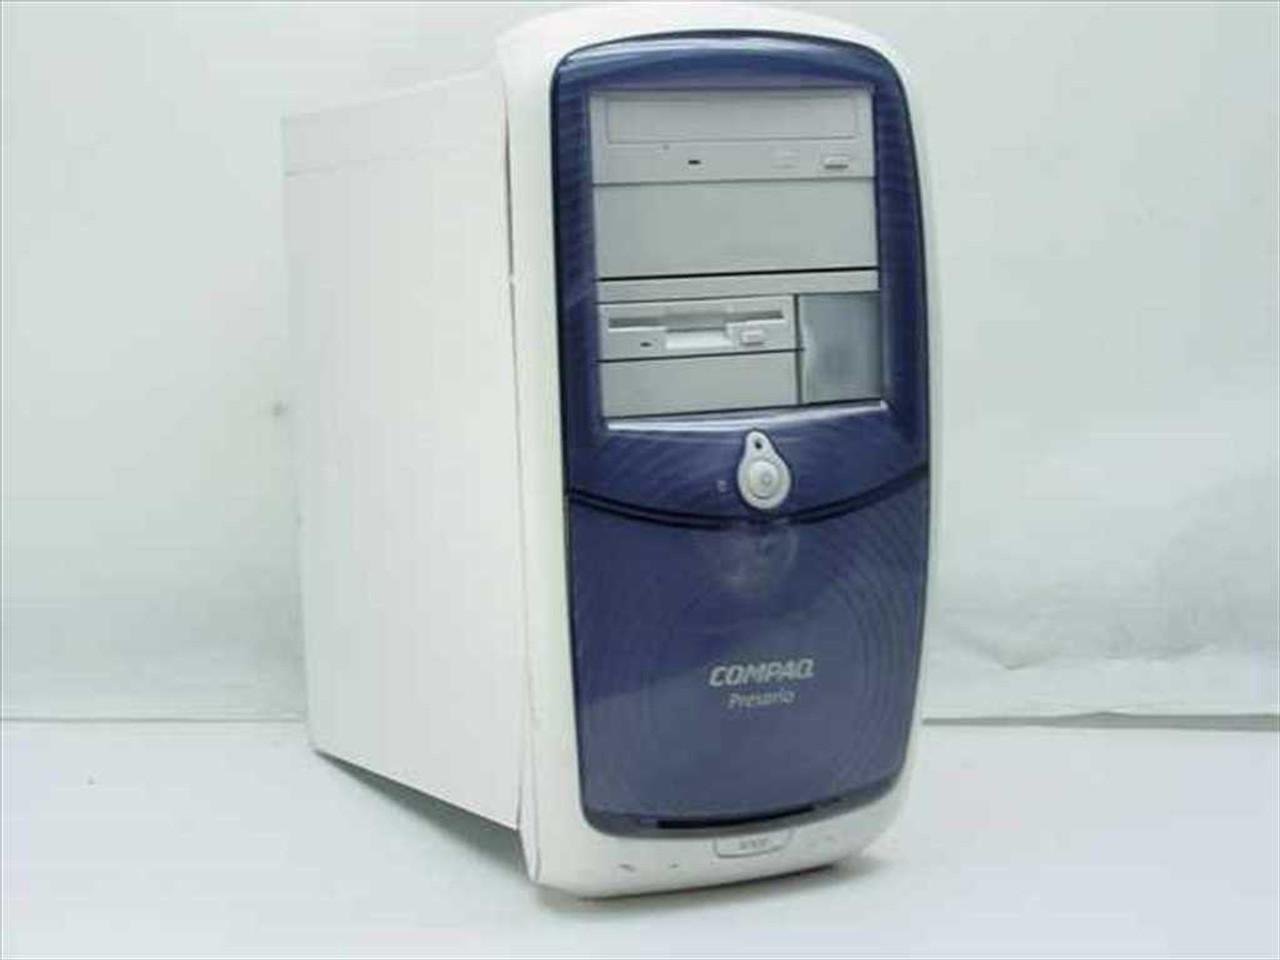 Compaq 5WV254 Compaq Presario 5000 Series PC tower ...